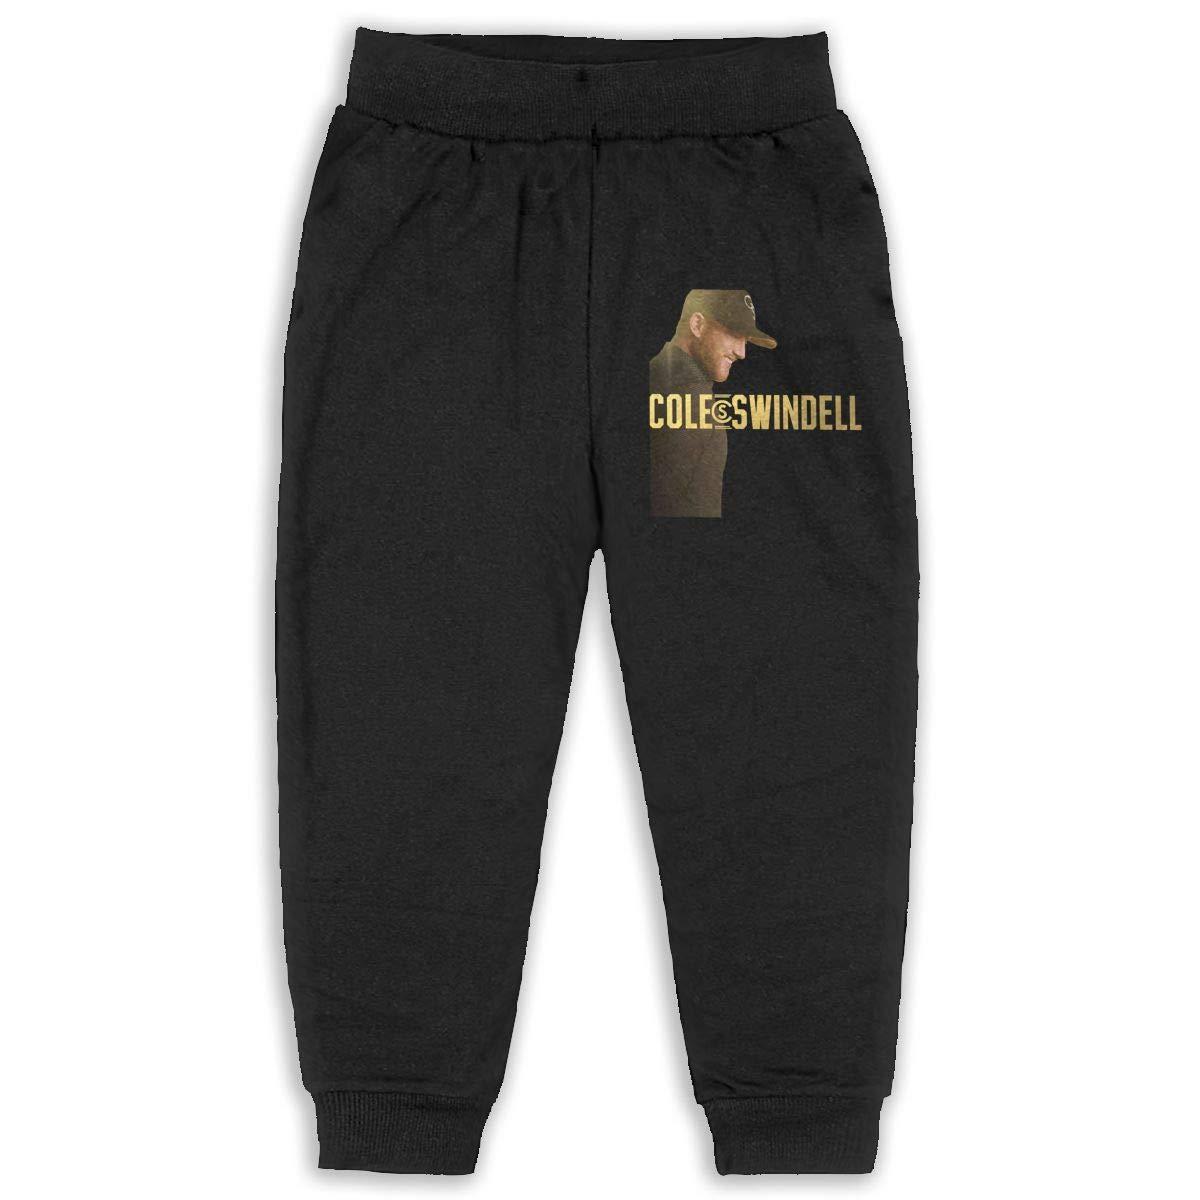 Trisharosew Kids Cole Swindell Music Band Boys Girls Sweatpants Basic Pants Back Pocket Black